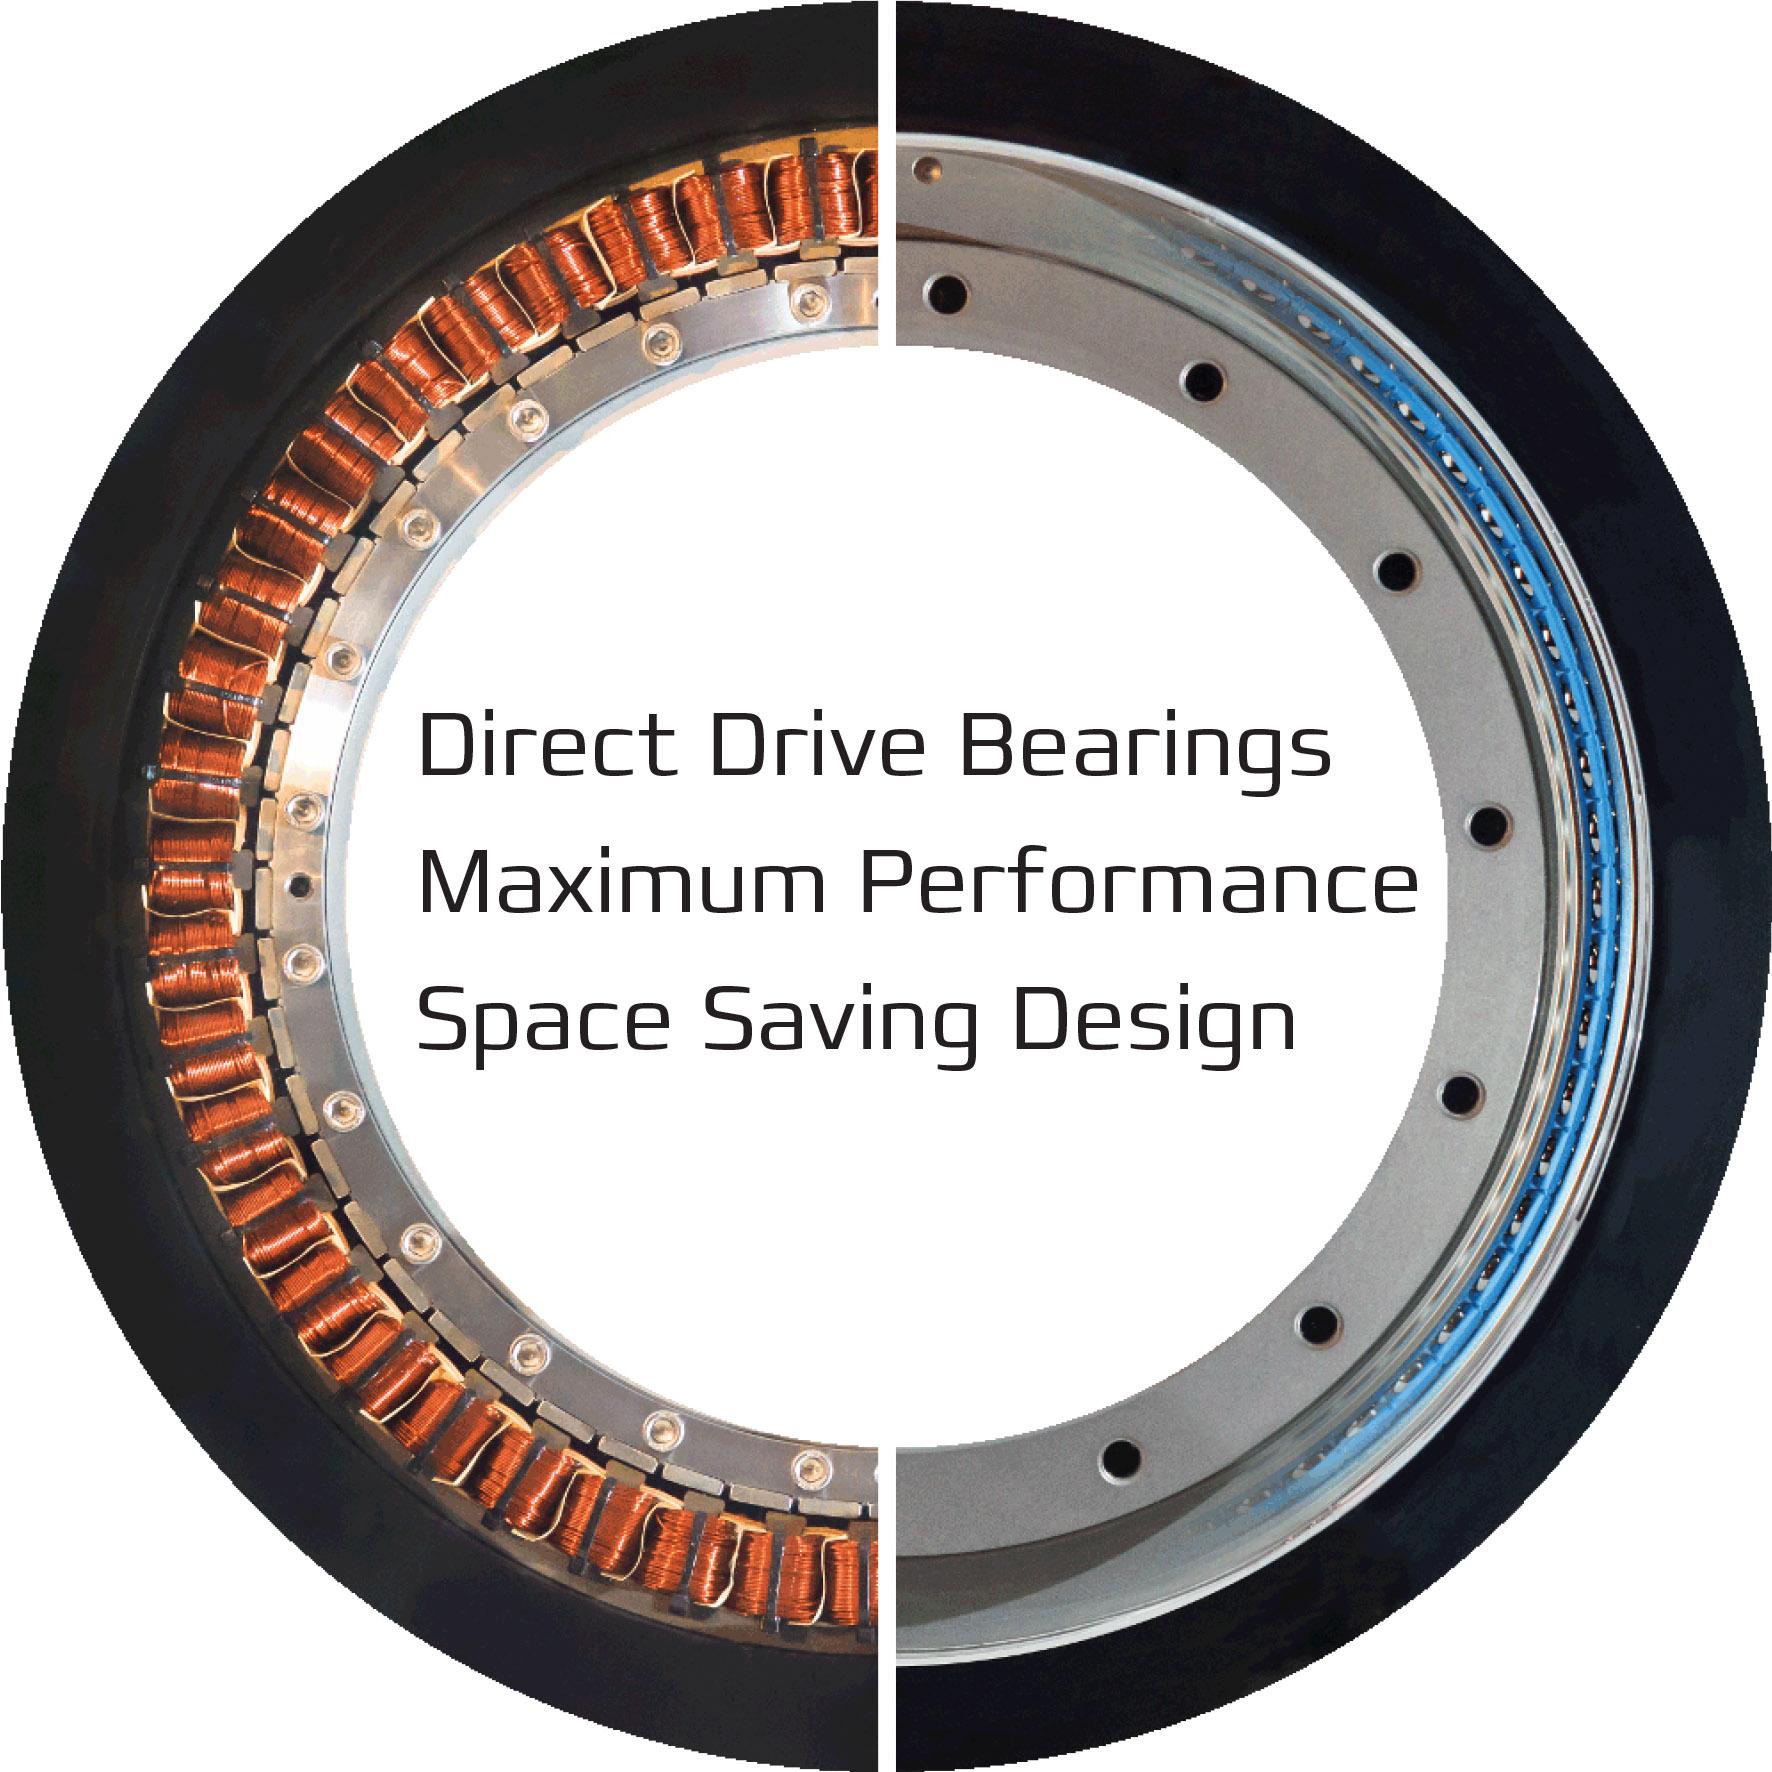 Direct Drive bearing